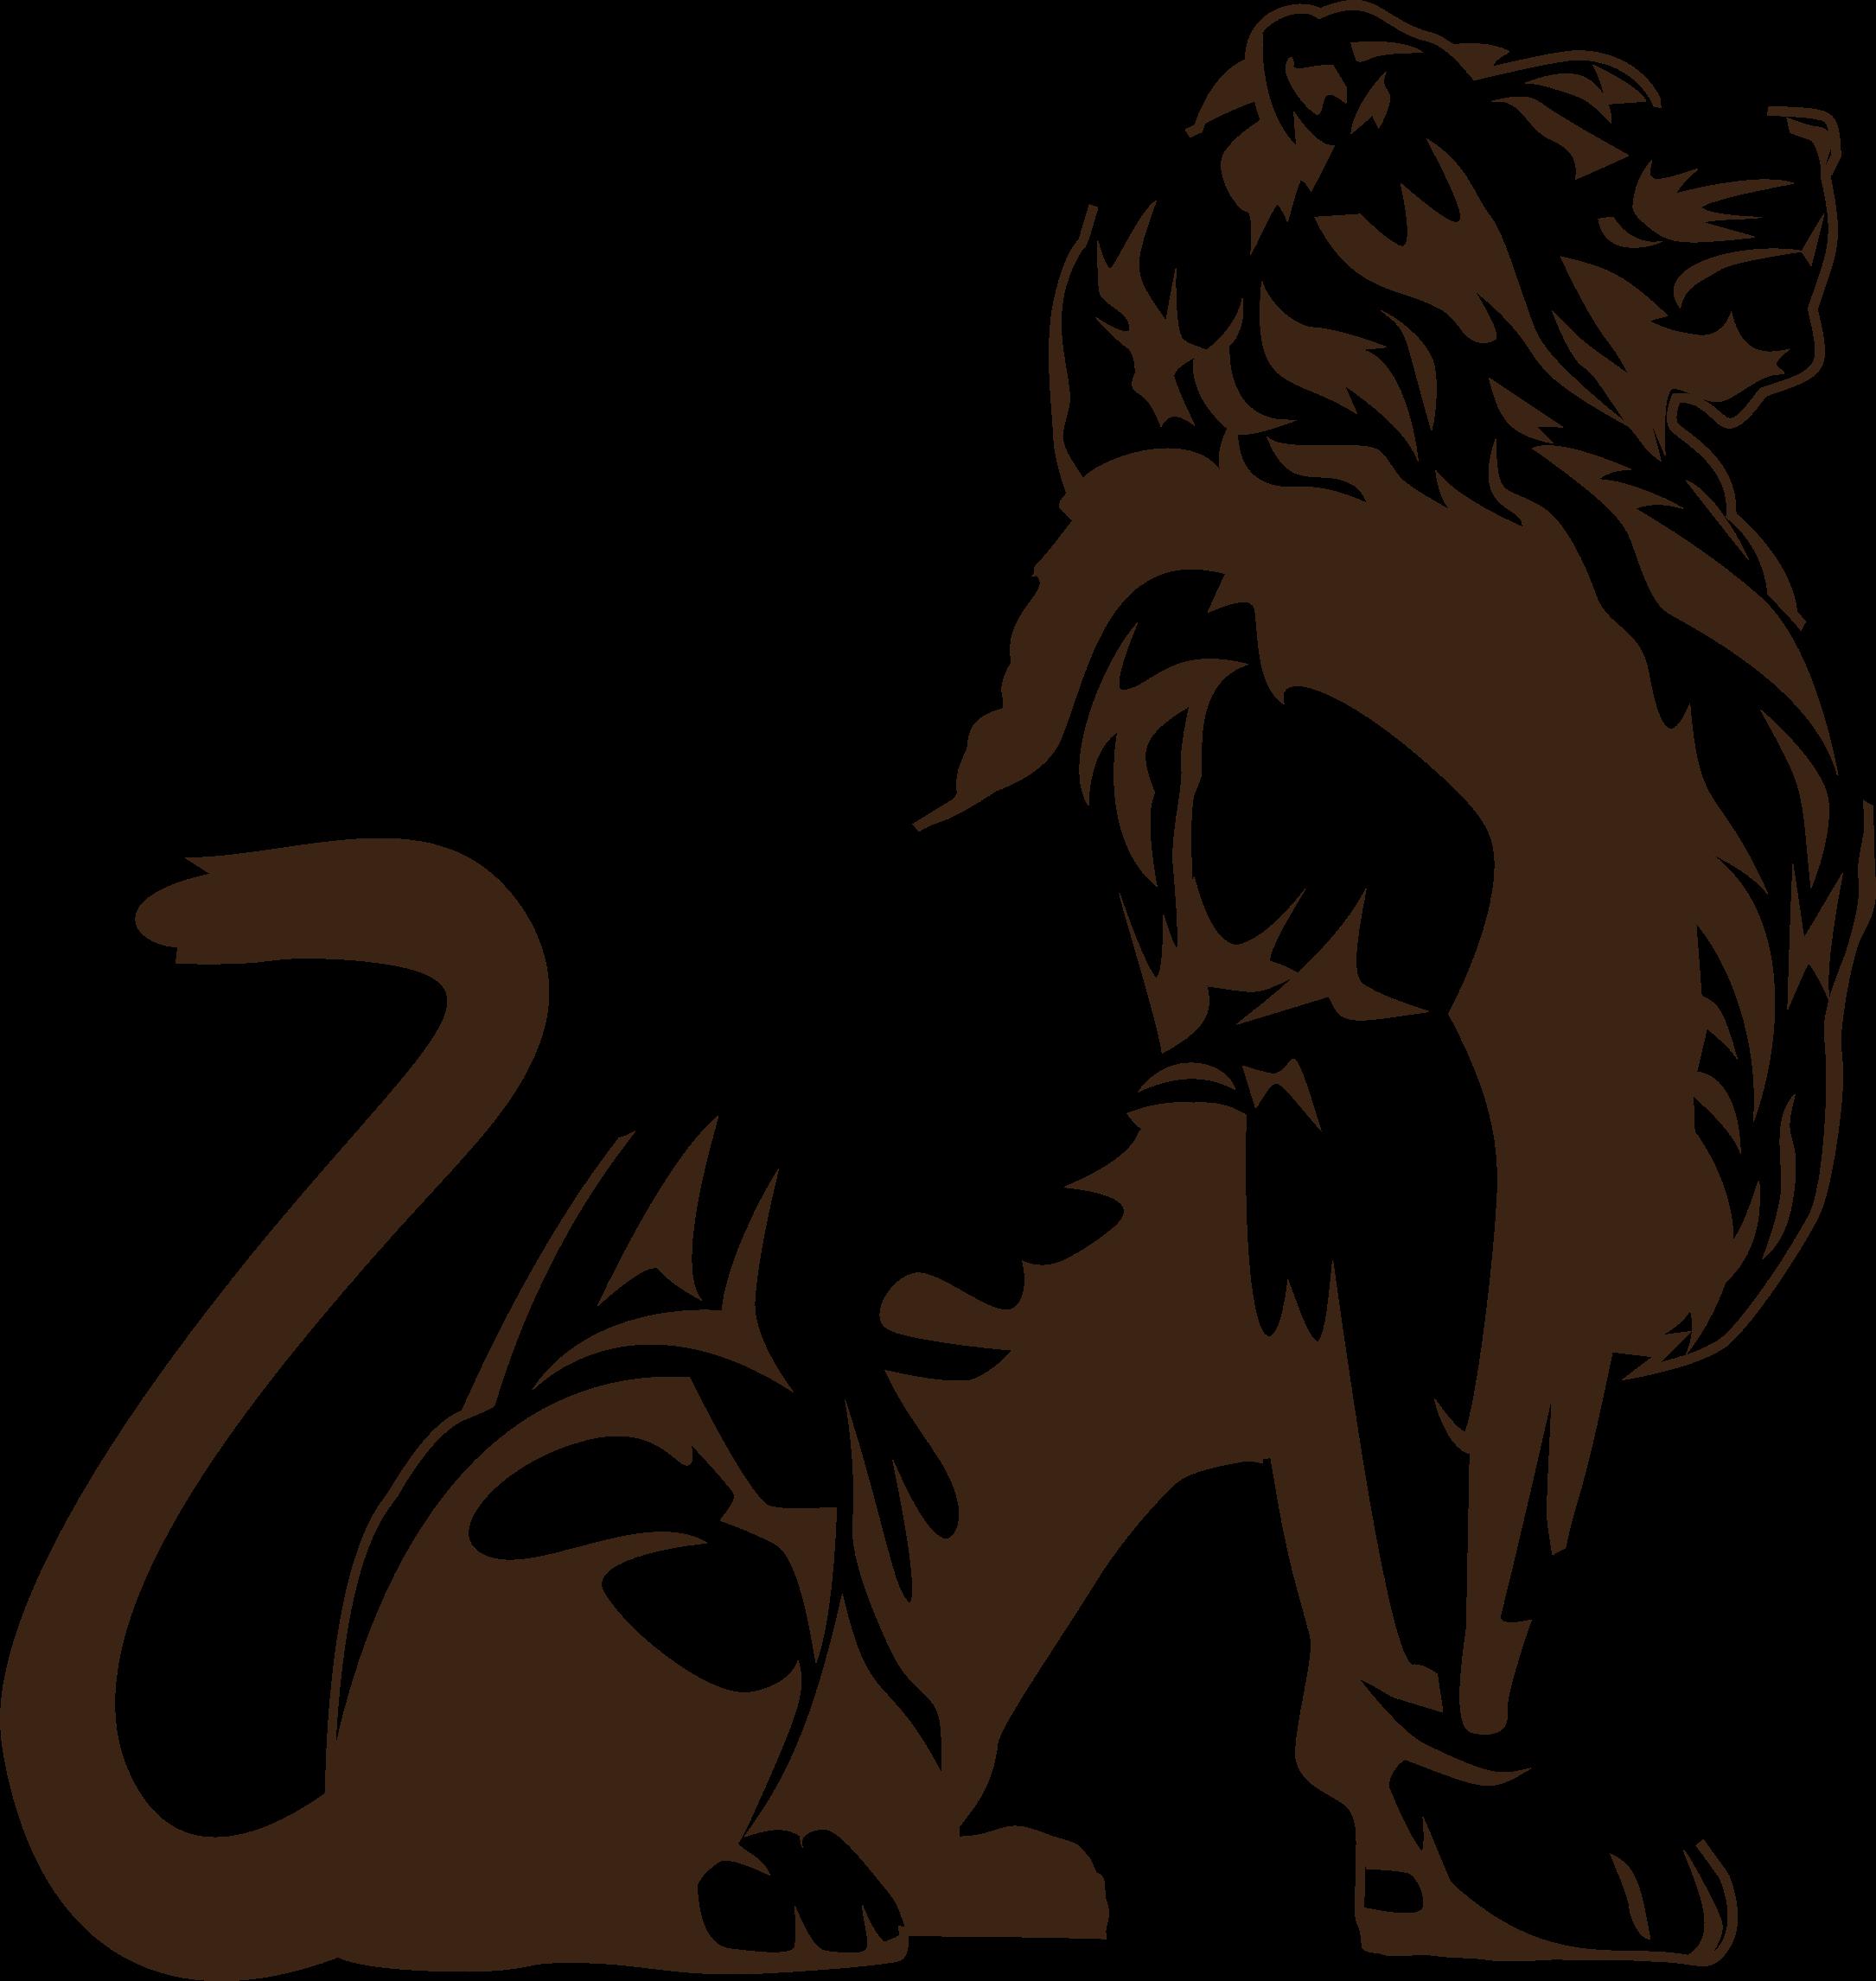 clipart stylistic lion silhouette cat silhouette clip art free downloads cat silhouette clip art free